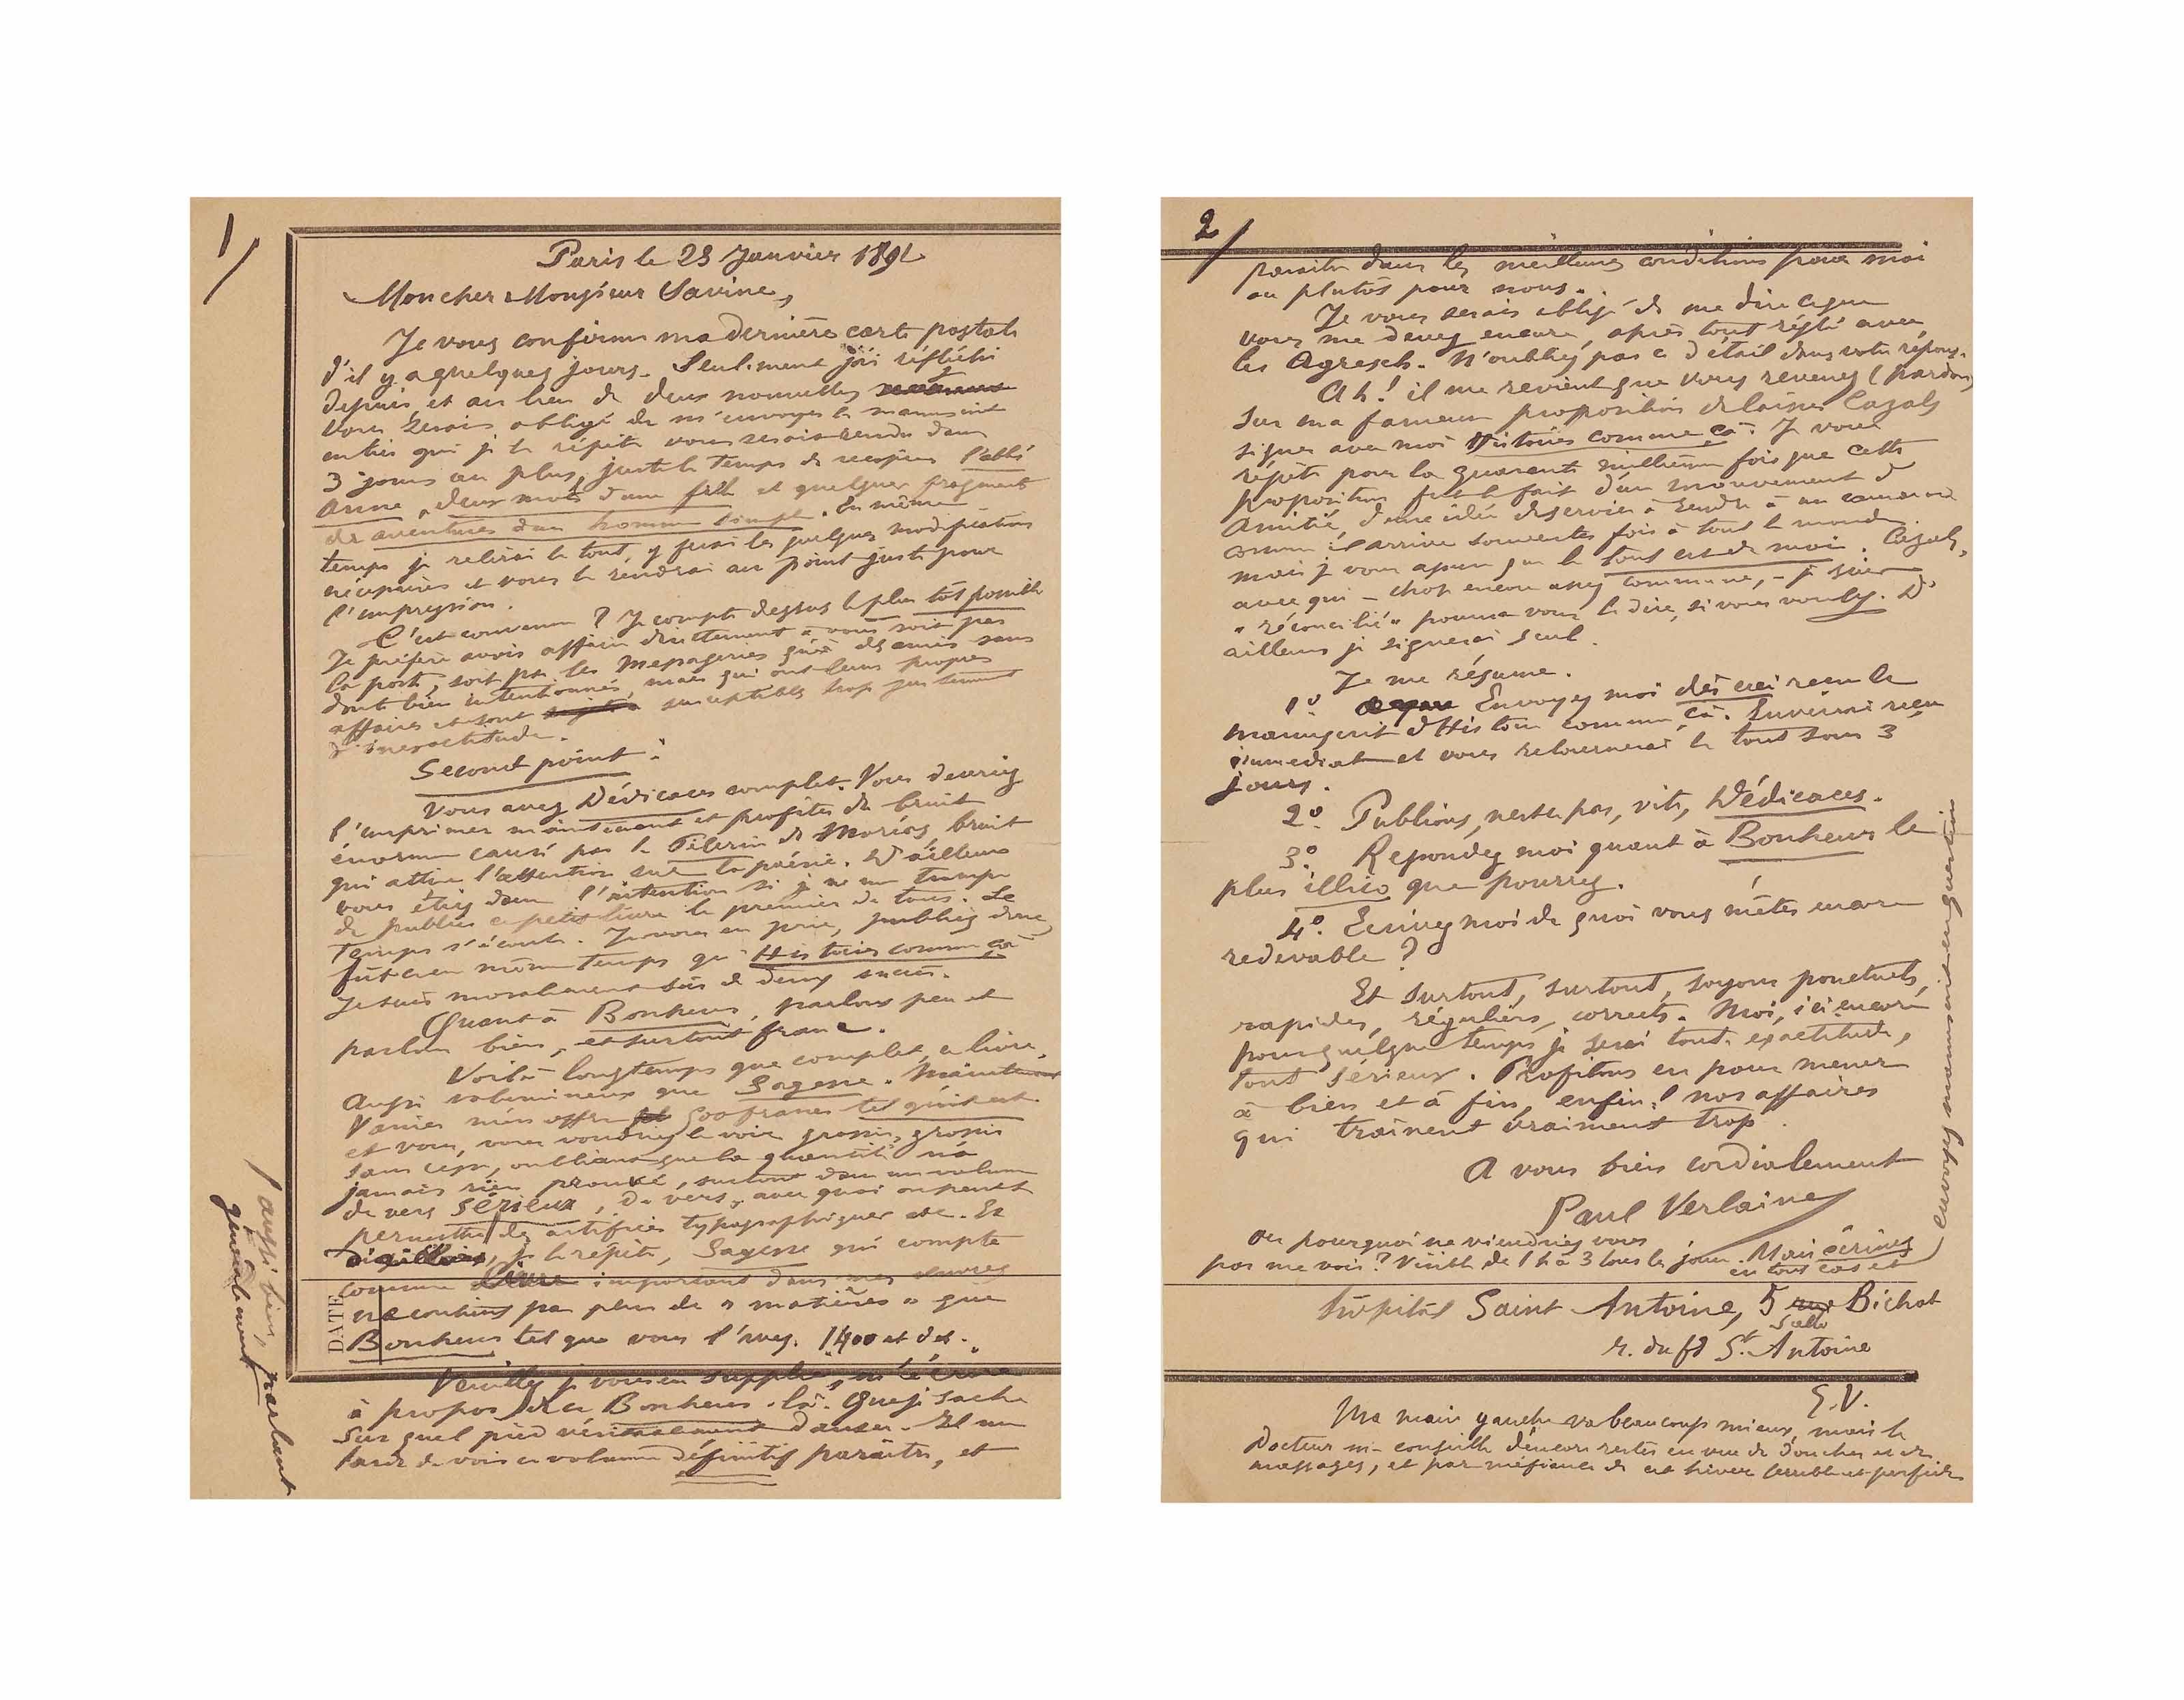 Albert SAVINE. Lettre autograp